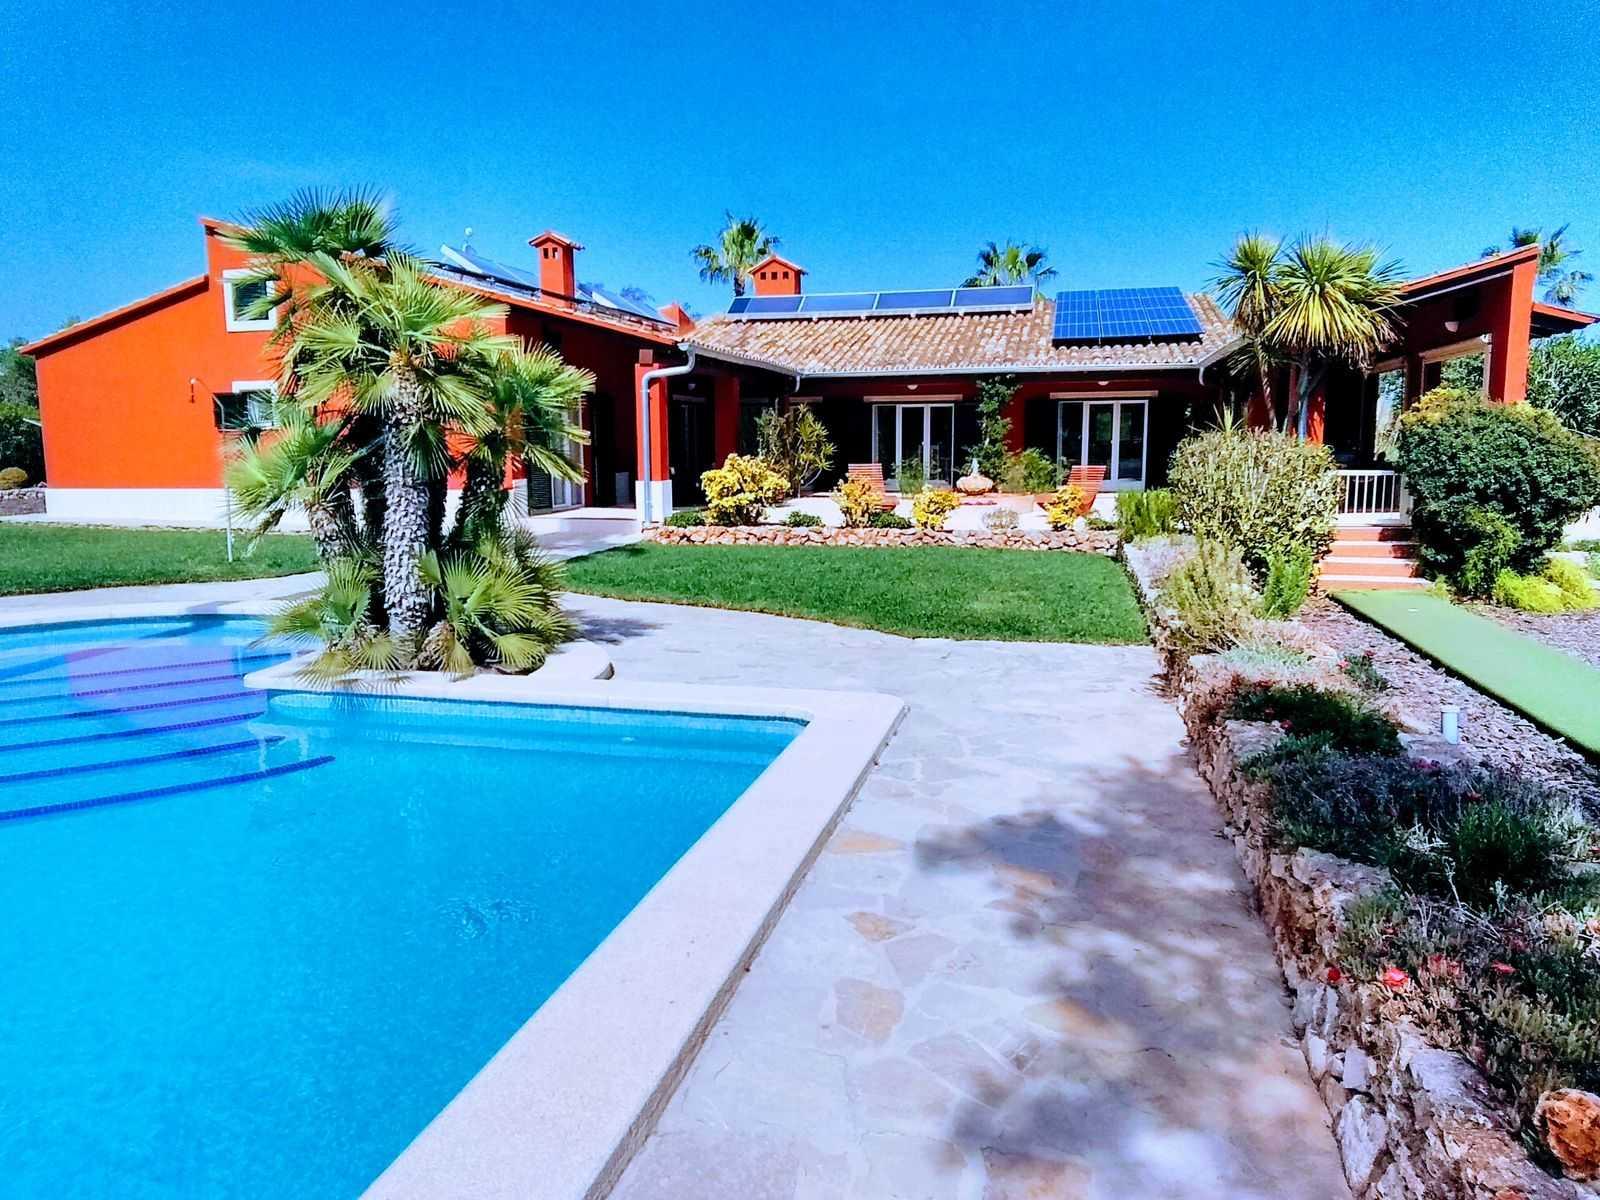 Pool - Terrasse - Haus